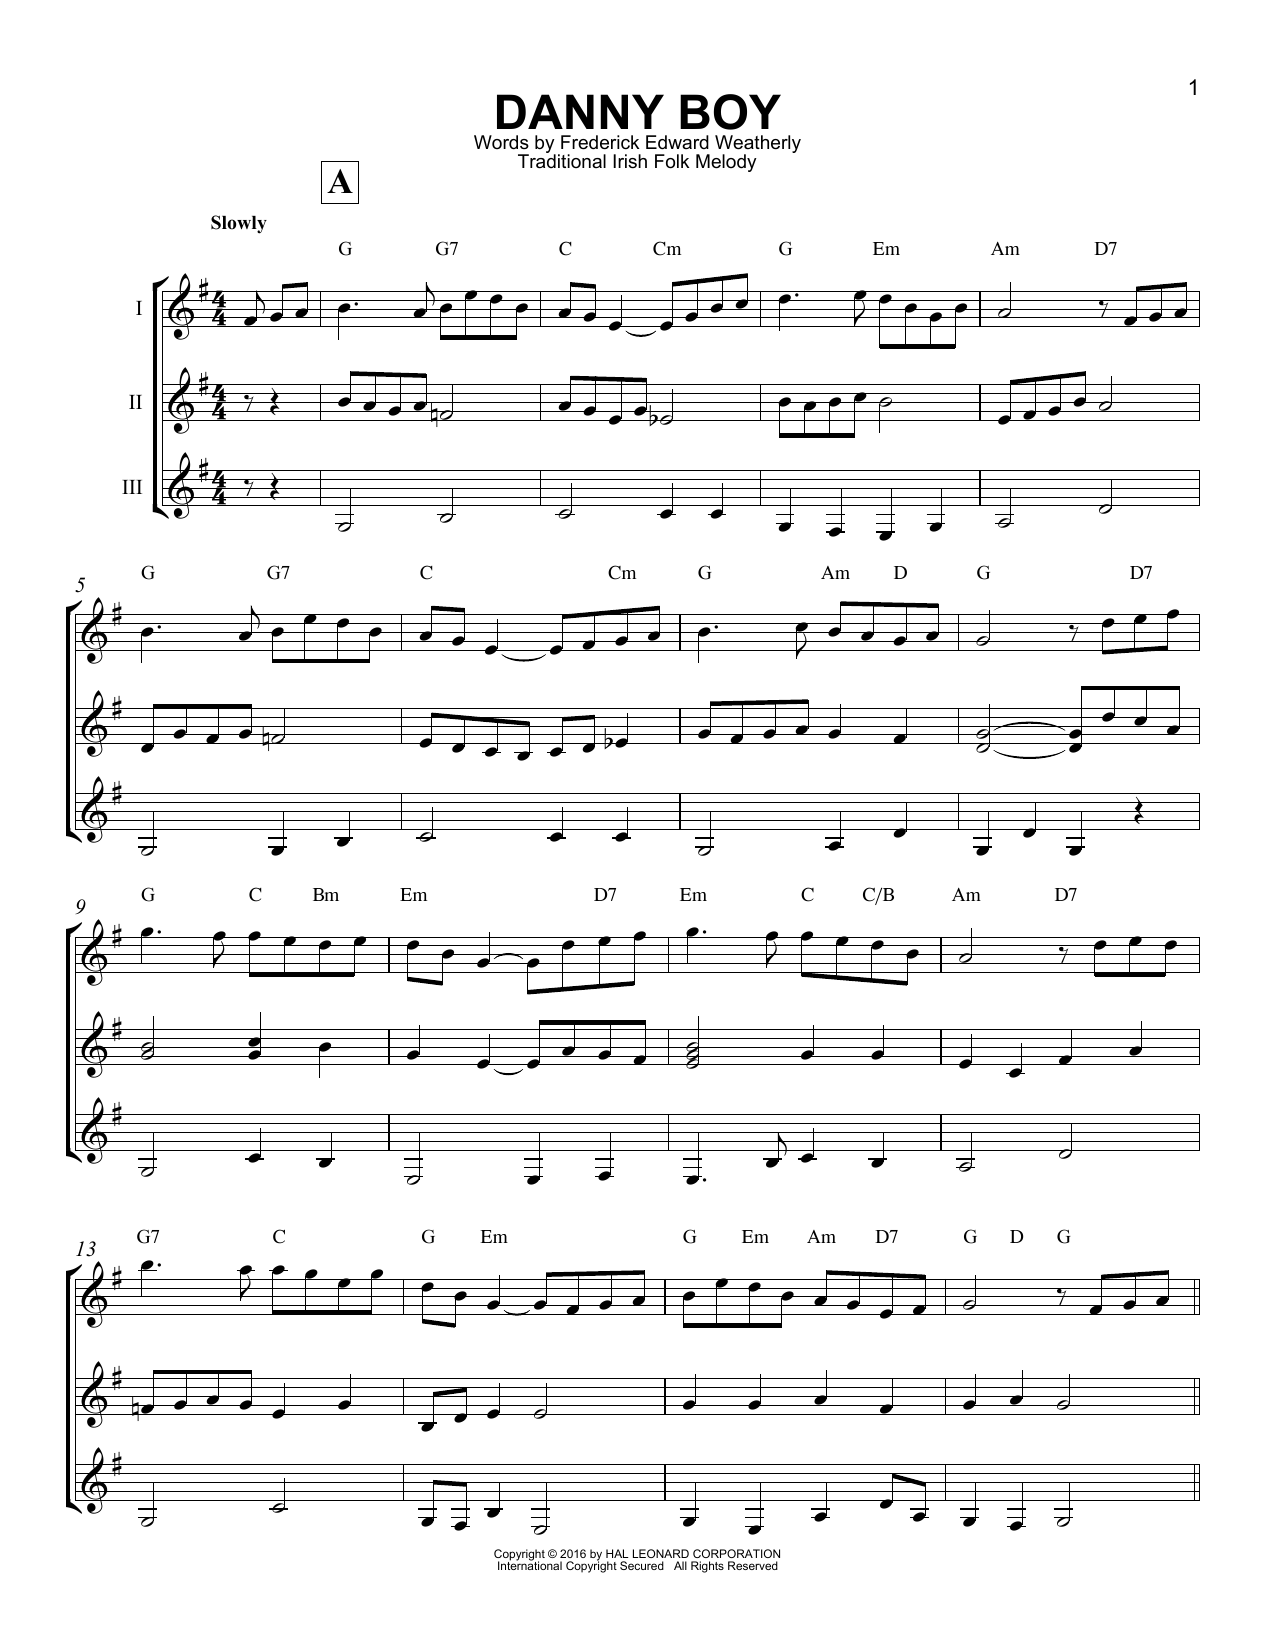 Sheet Music Digital Files To Print Licensed Frederick Edward